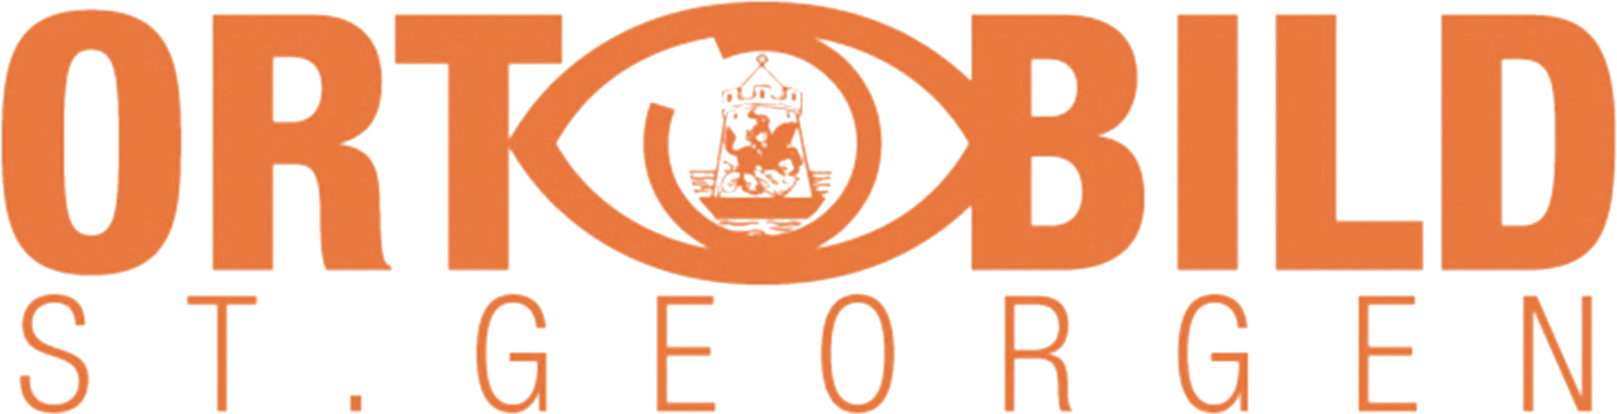 ORT-BILD-LOGO